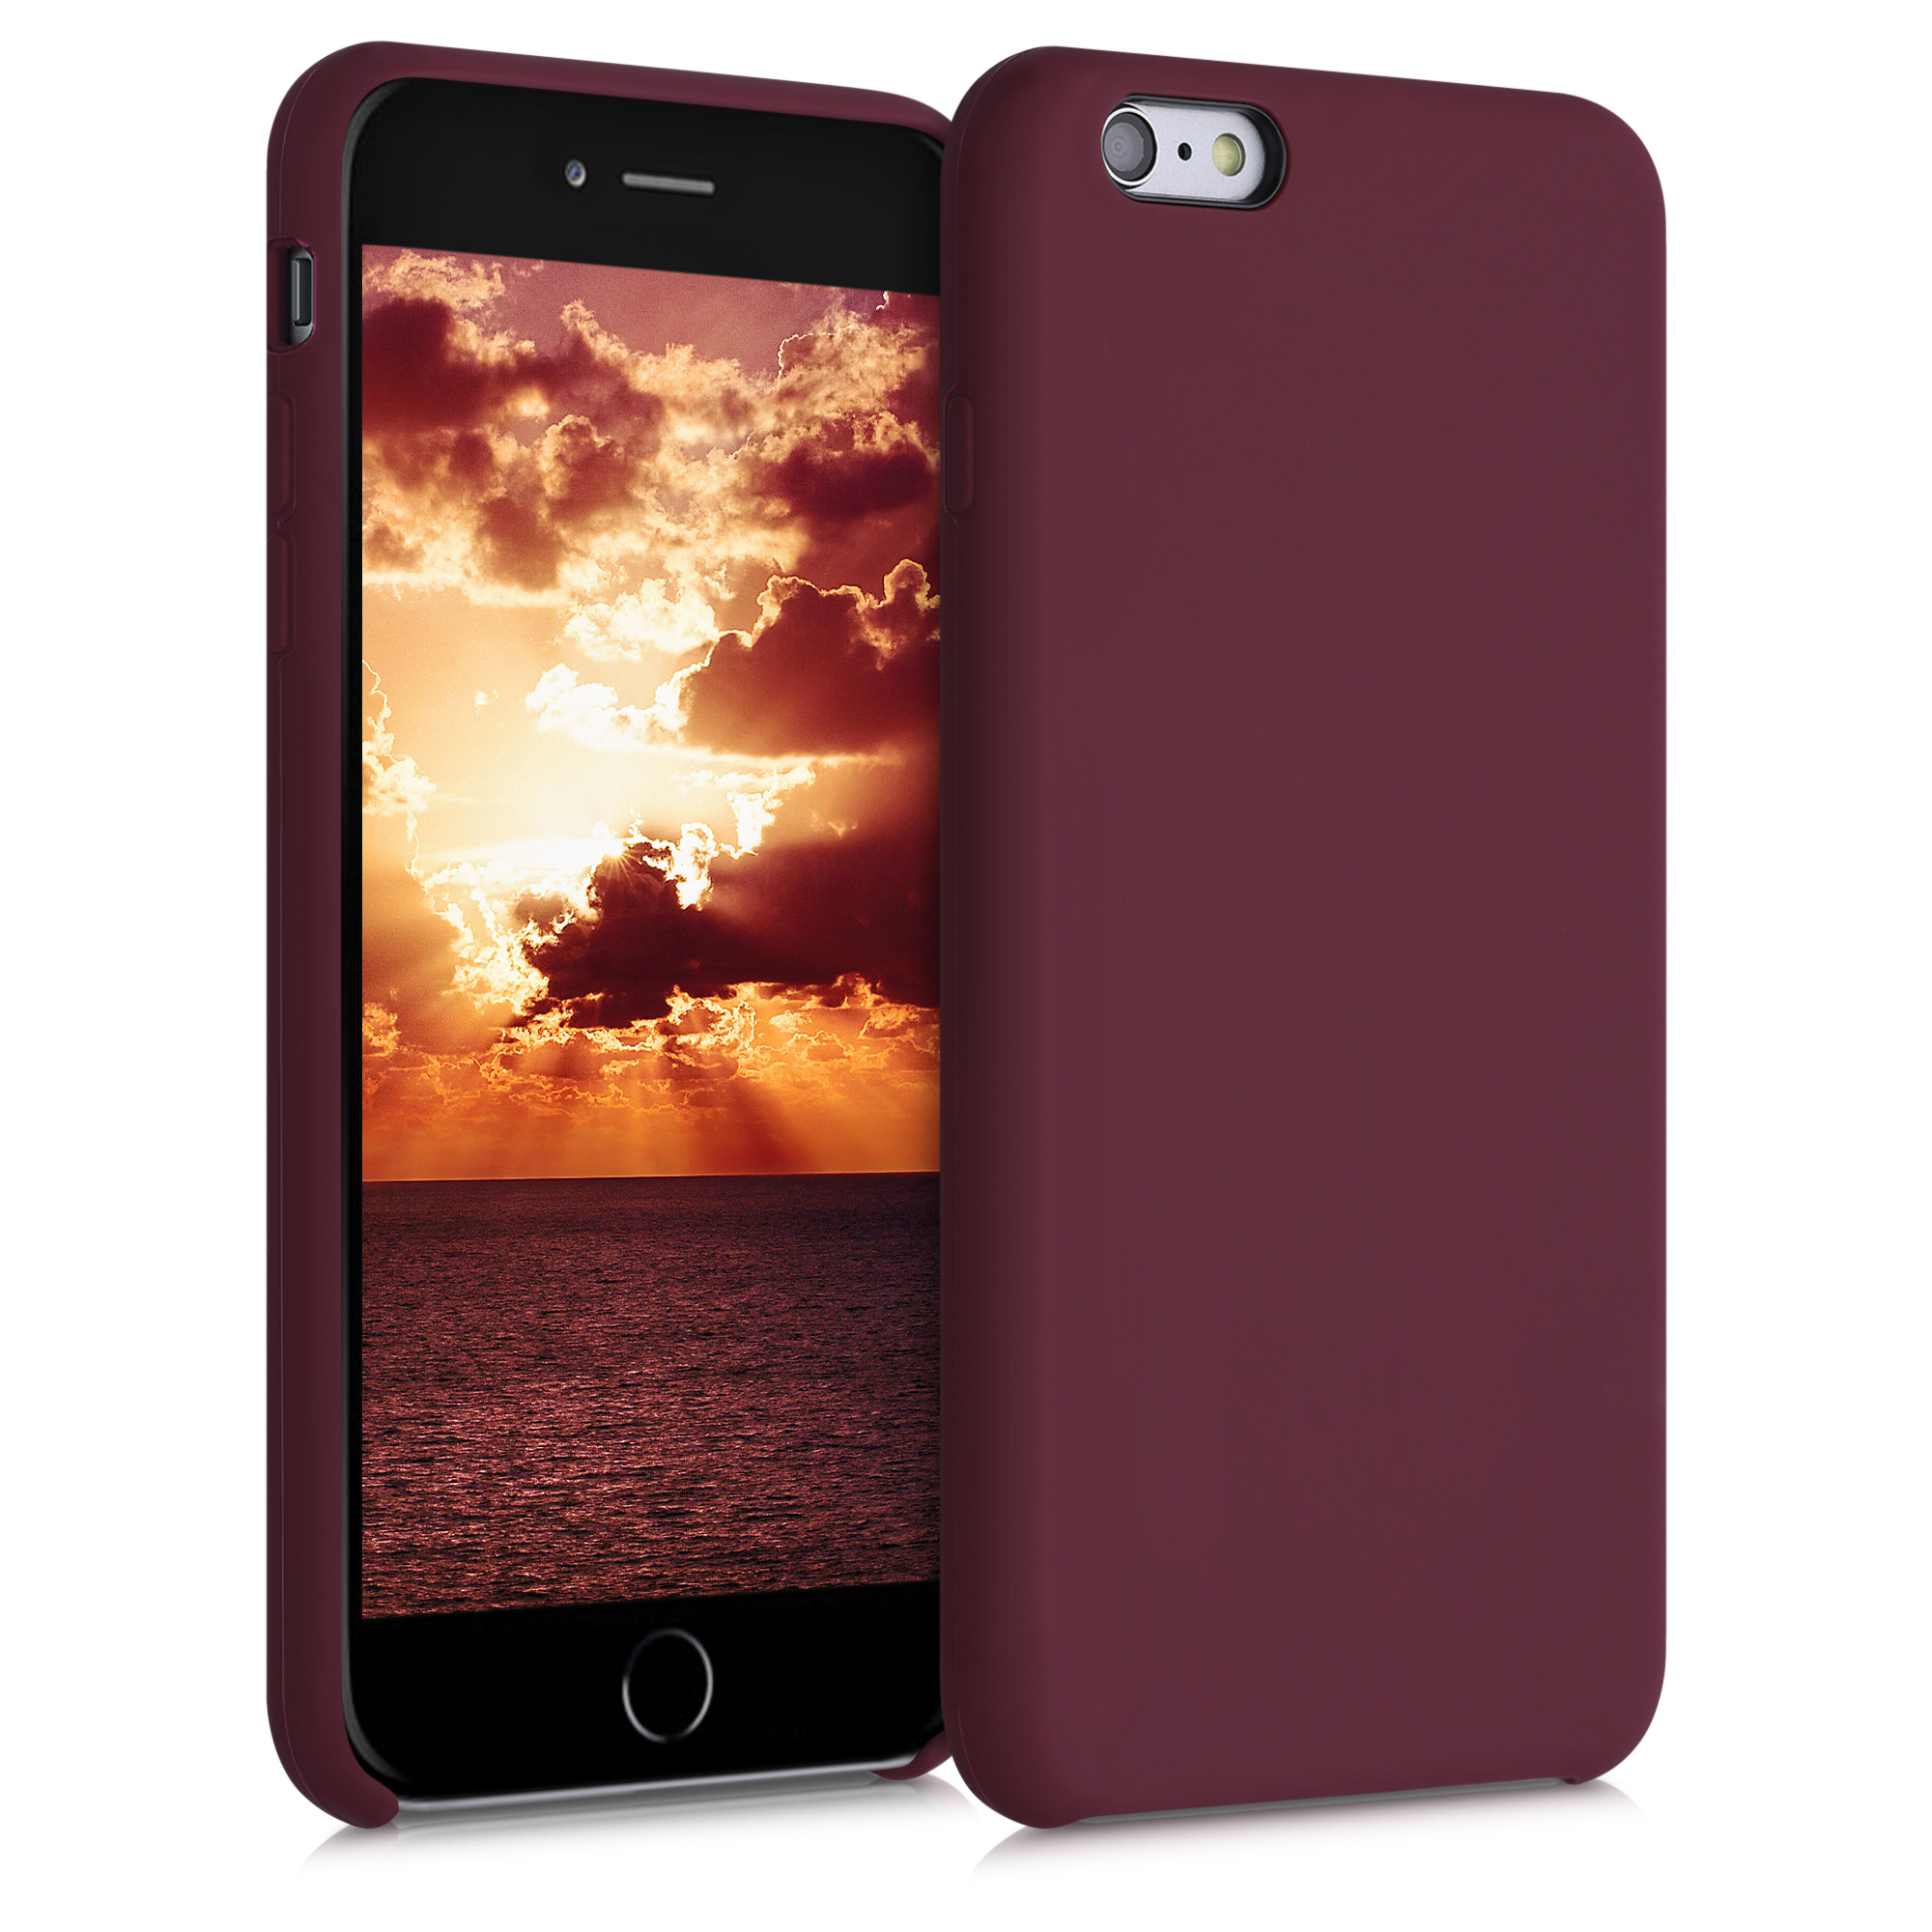 Kvalitní silikonové TPU pouzdro pro Apple iPhone 6 Plus / 6S - Tawny Red